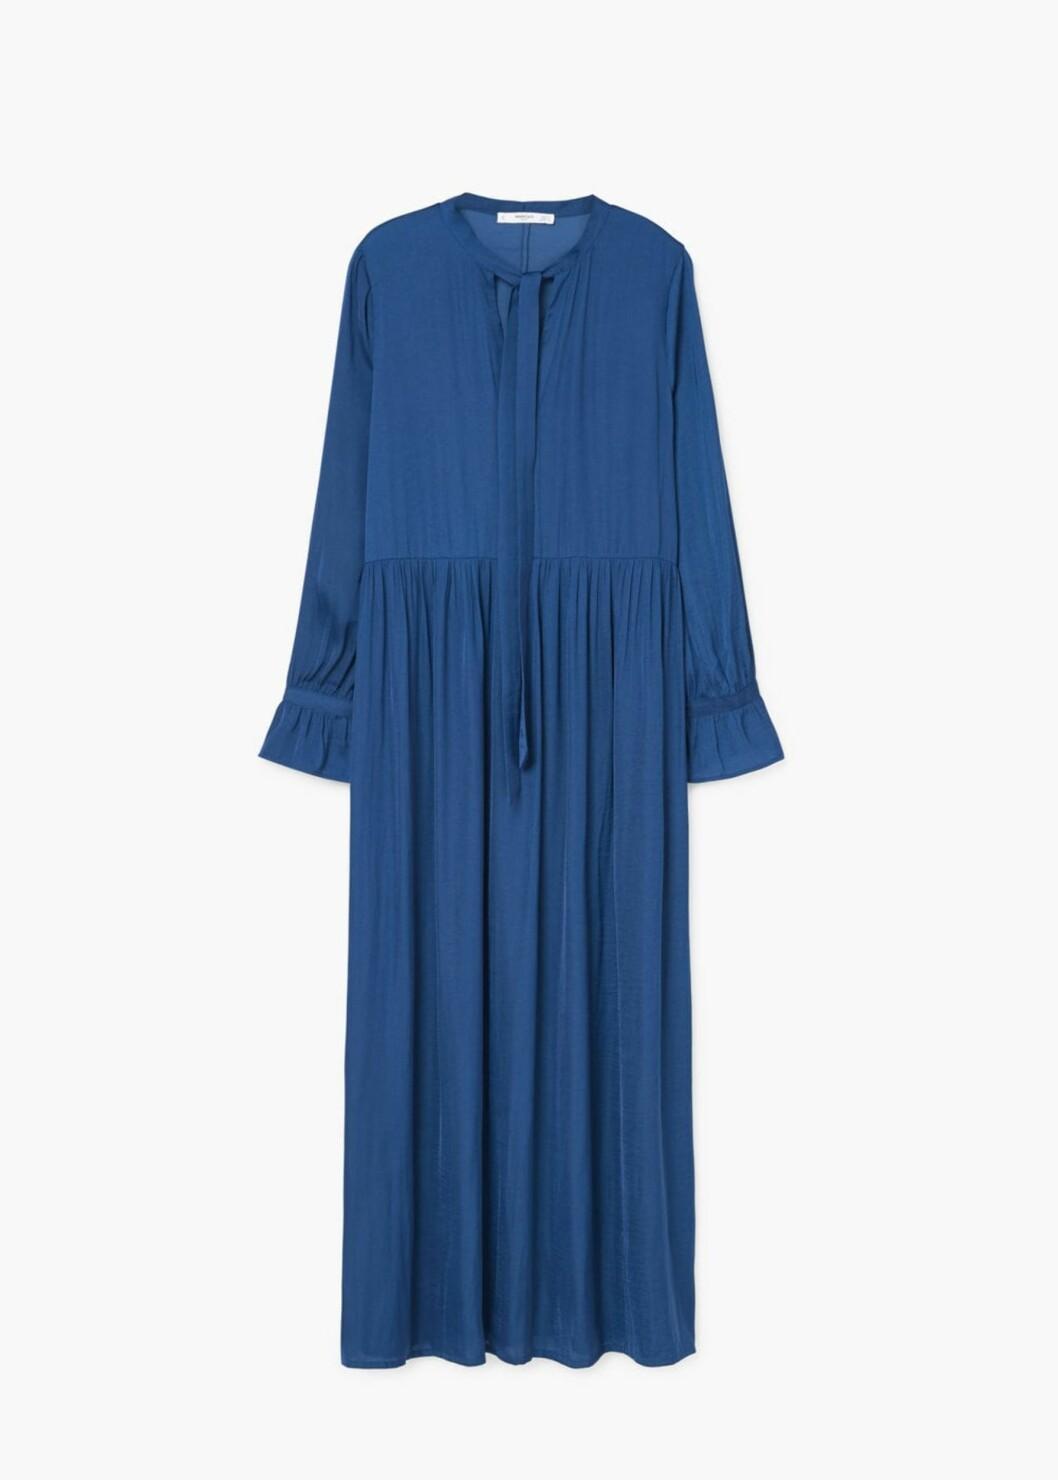 <strong>Kjole fra Mango | kr 699 | http:</strong>//shop.mango.com/NO/p1/damer/kl%C3%A6r/kjoler/kjole-med-sl%C3%B8yfe?id=13093715_56&n=1&s=nuevo&ts=1500980400737